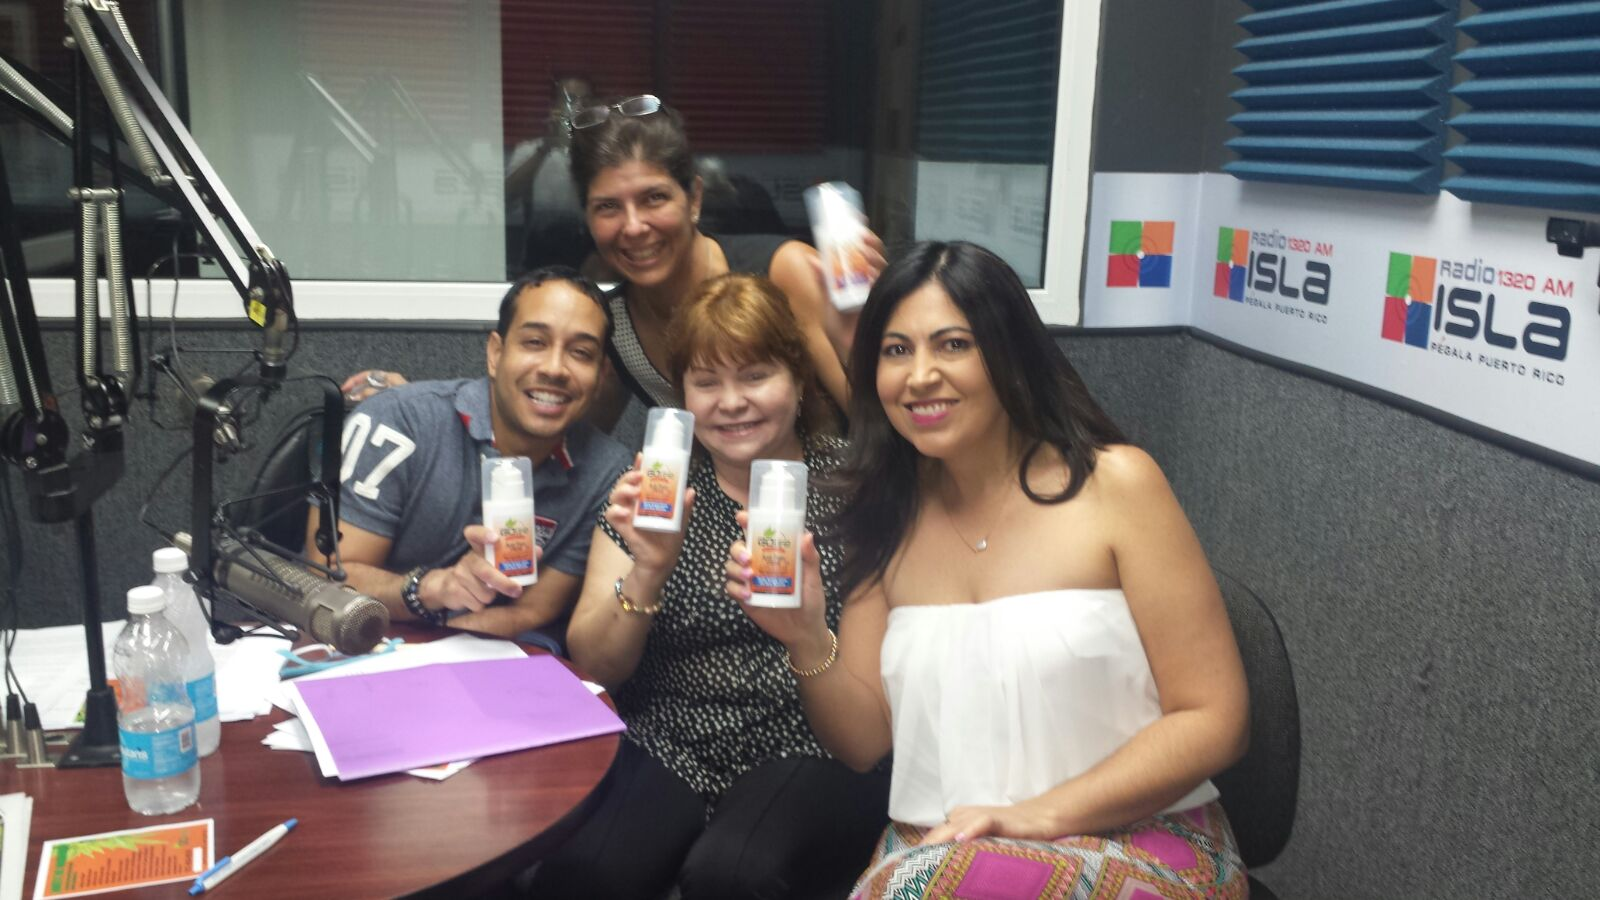 Entrevista Radioisla 1320